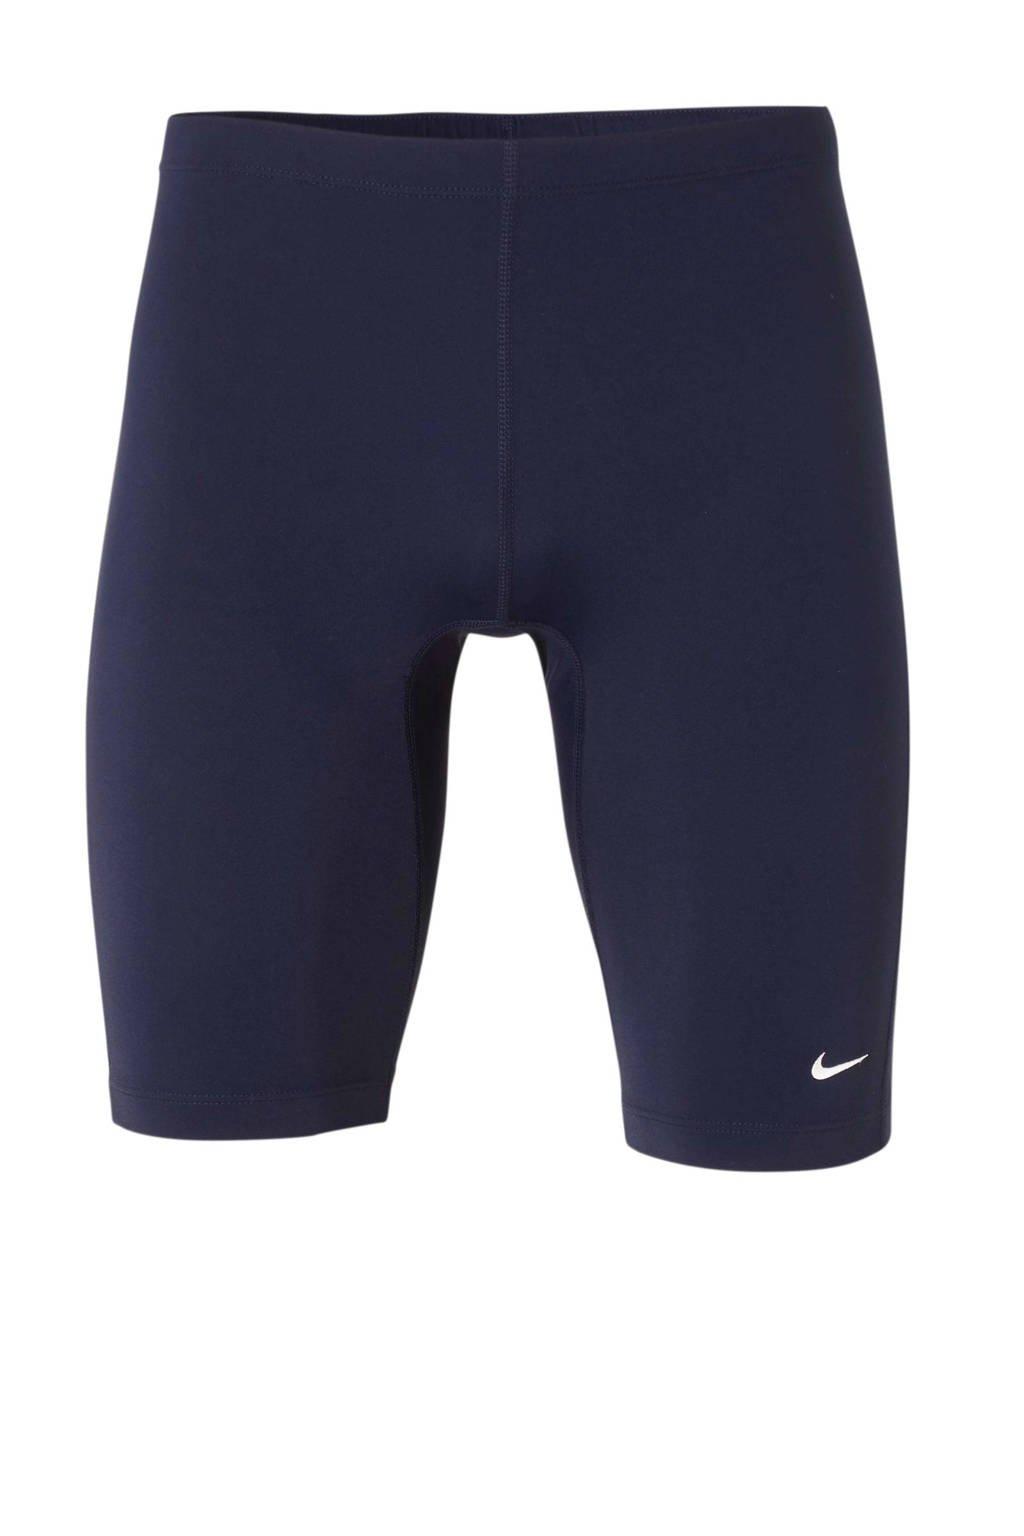 Nike jammer marine, Marine